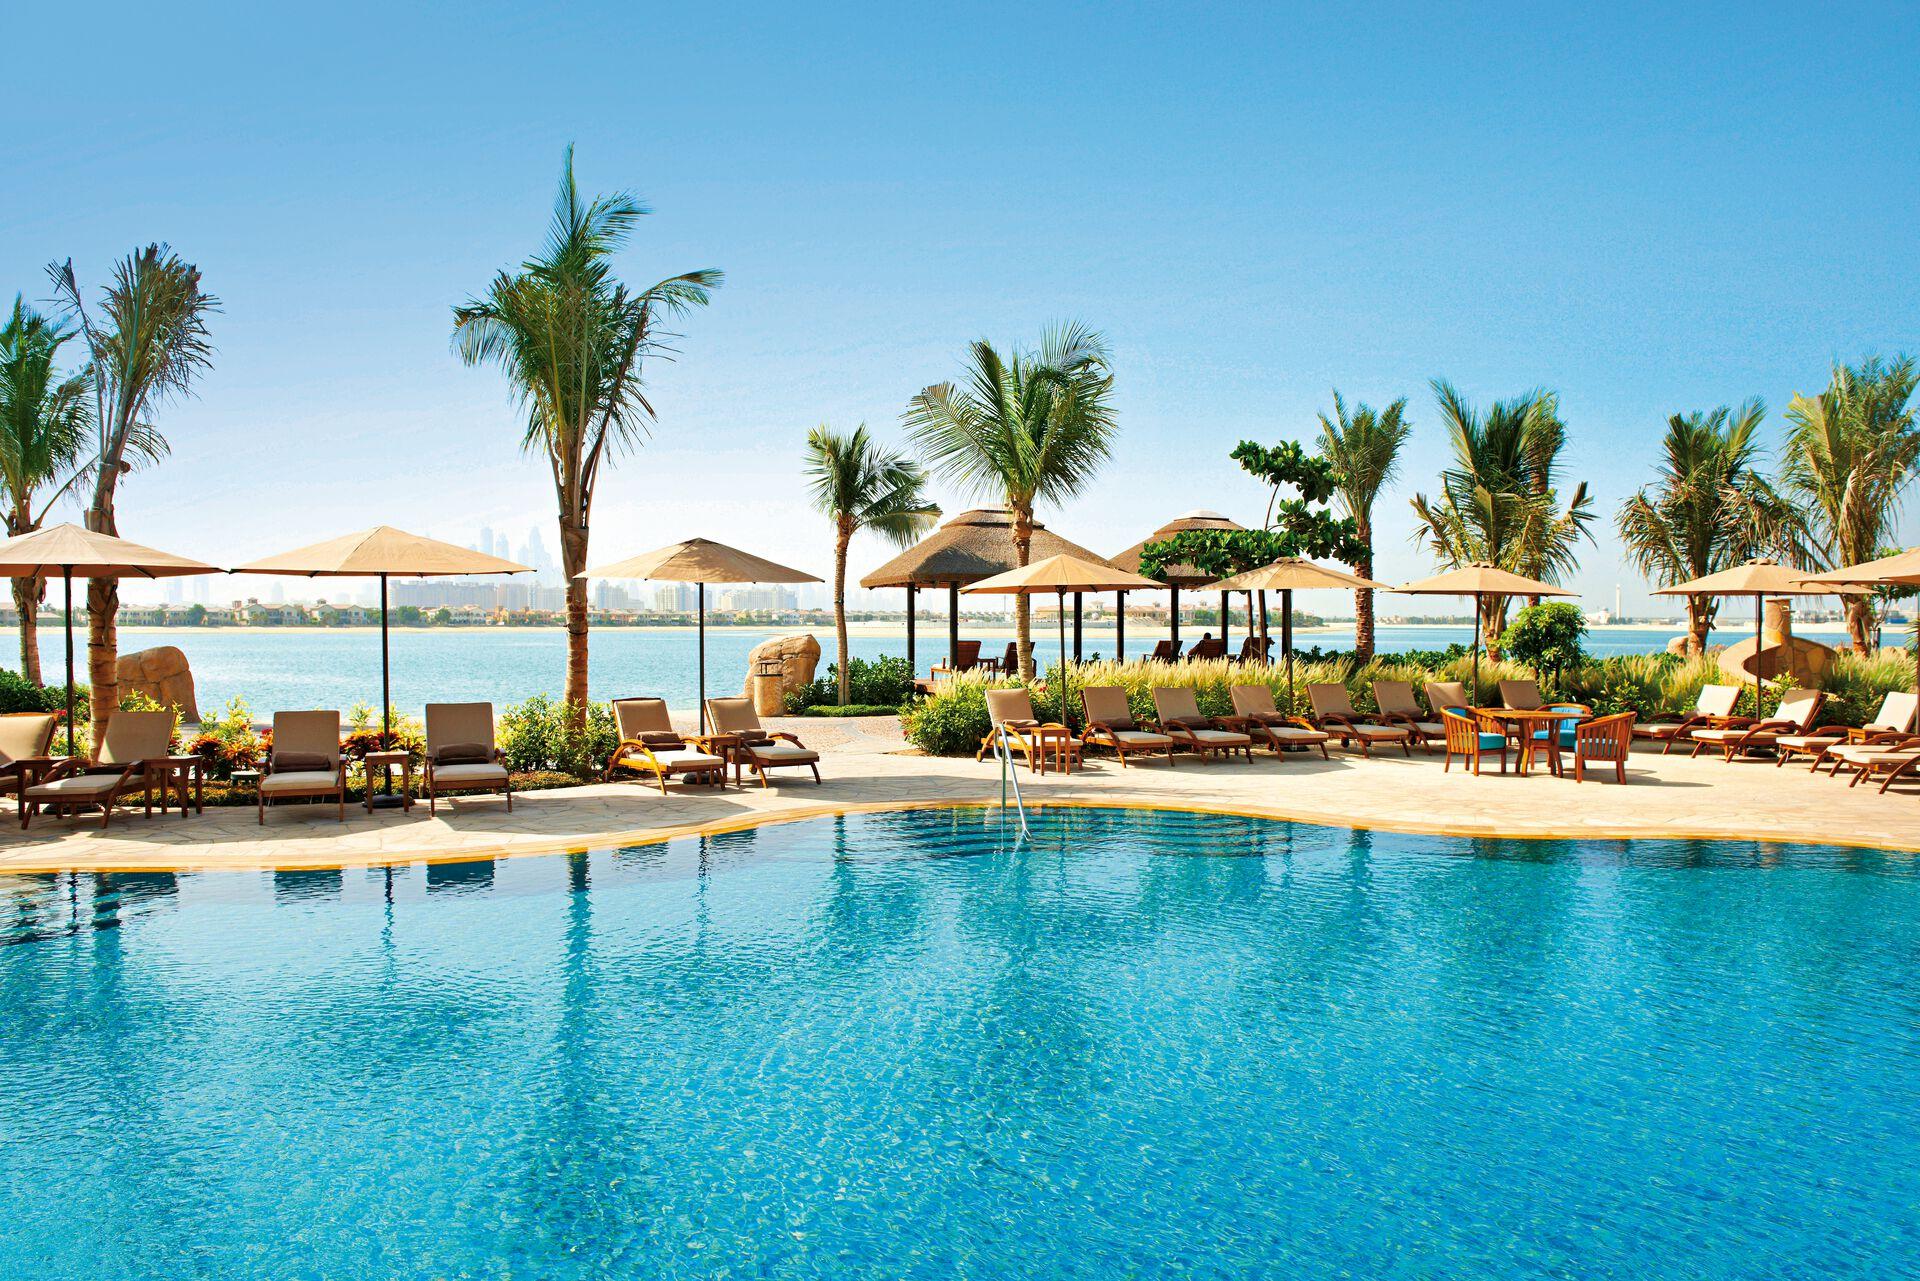 Séjour Emirats Arabes Unis - Sofitel Dubai The Palm - 5*